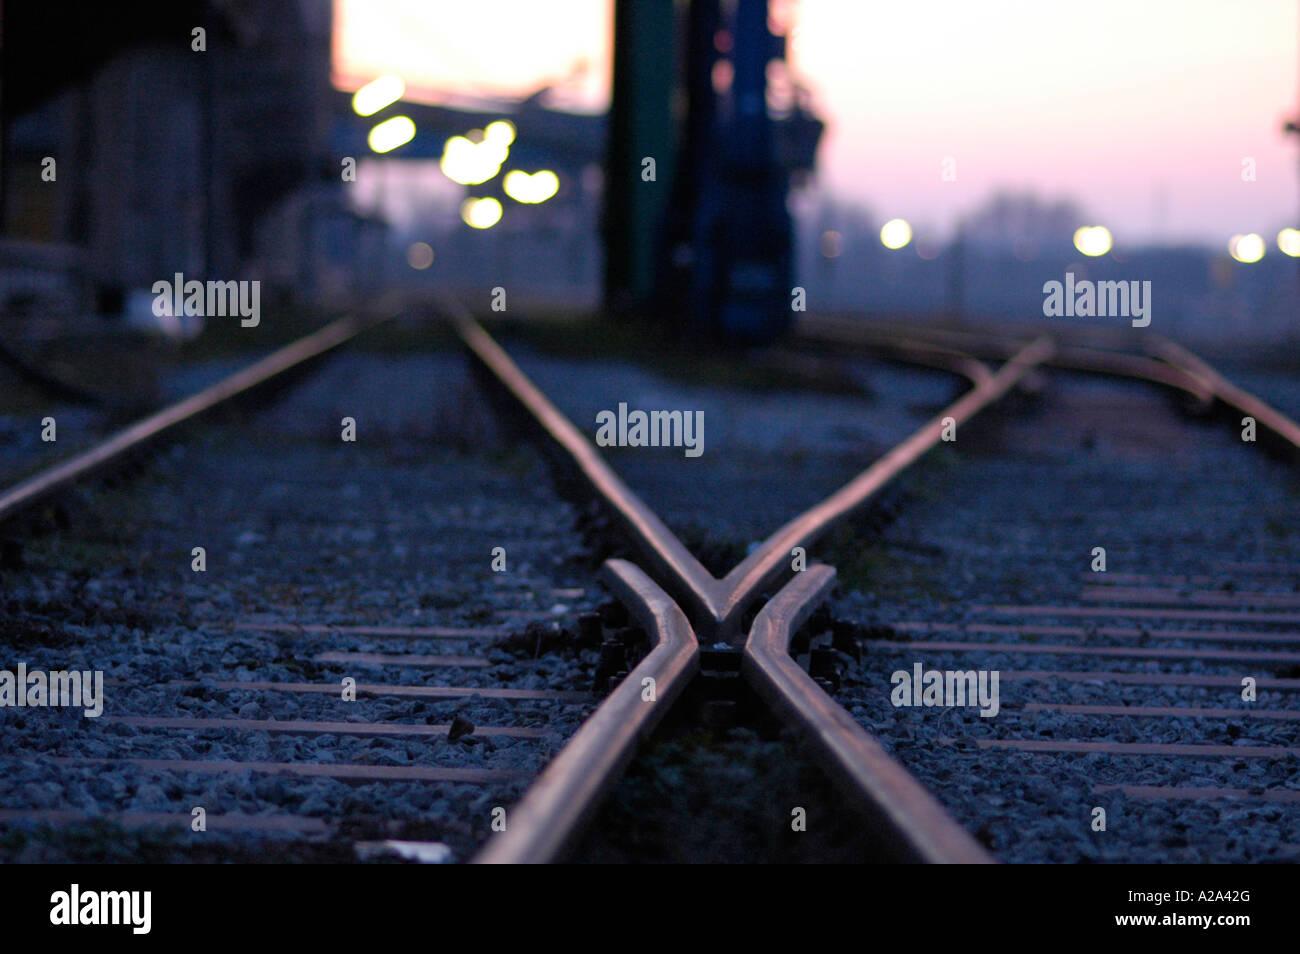 Vienna, railway tracks, bifurcation - Stock Image